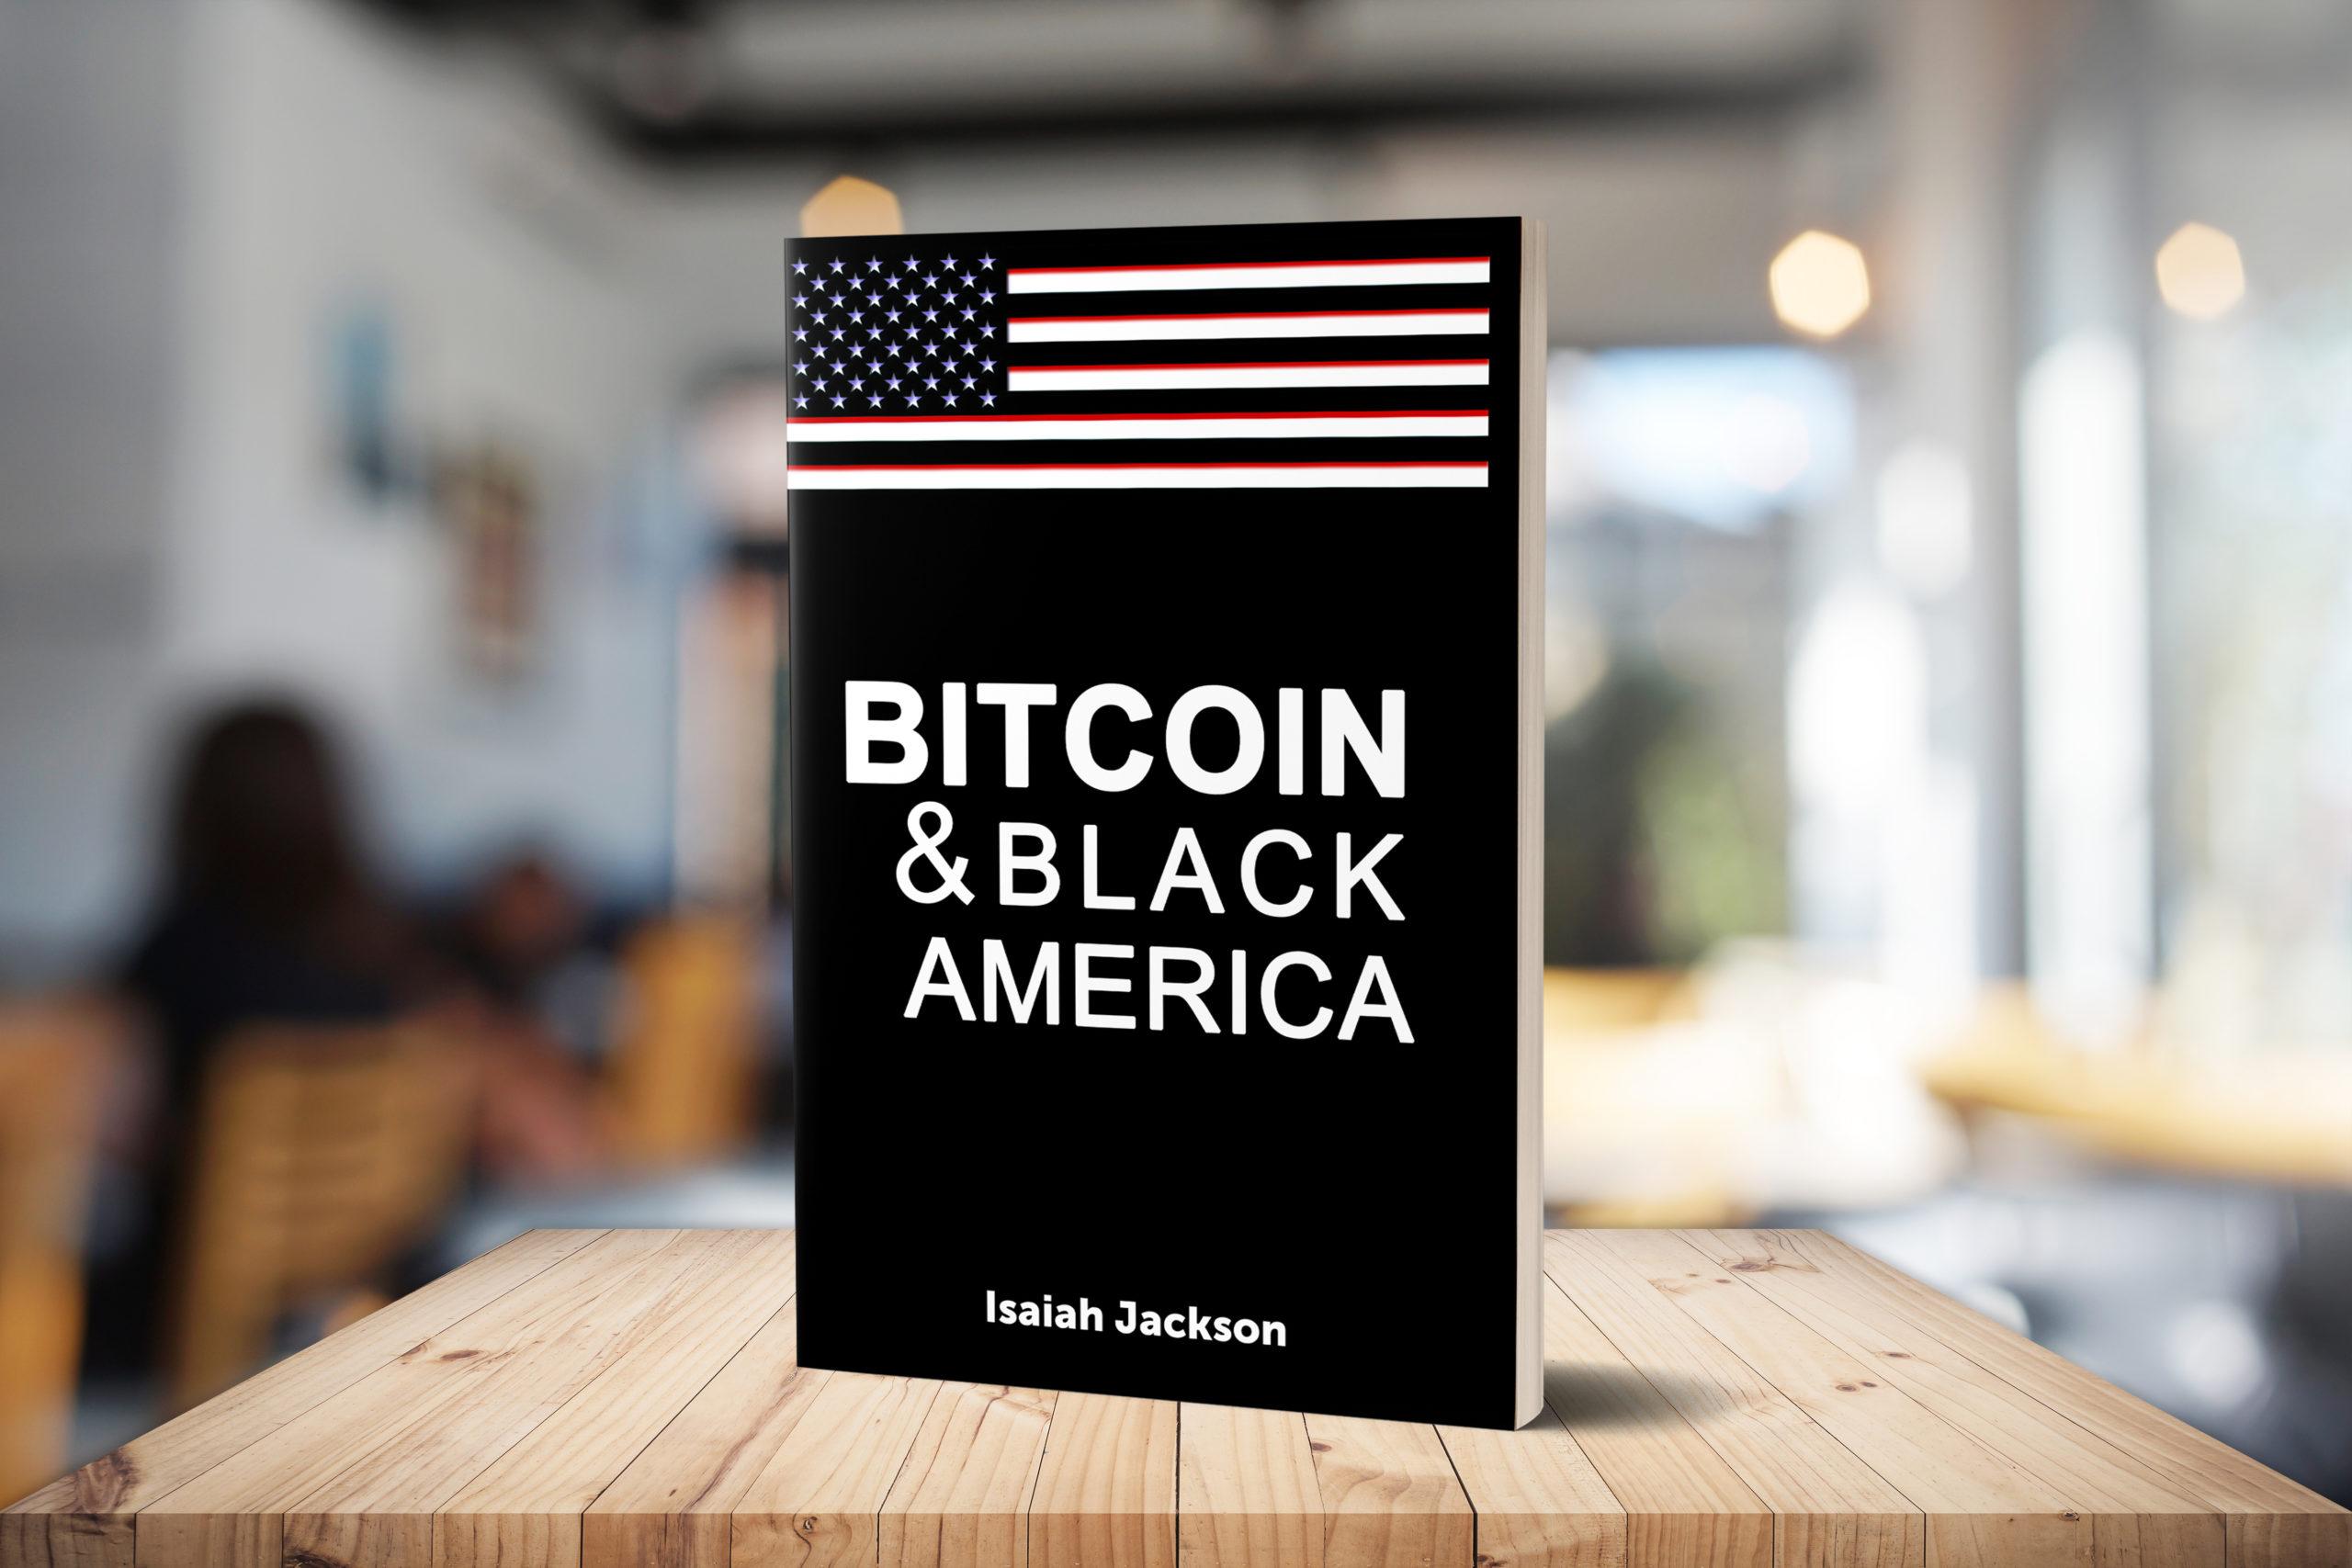 Bitcoin & Black America Book By Isaiah Jackson